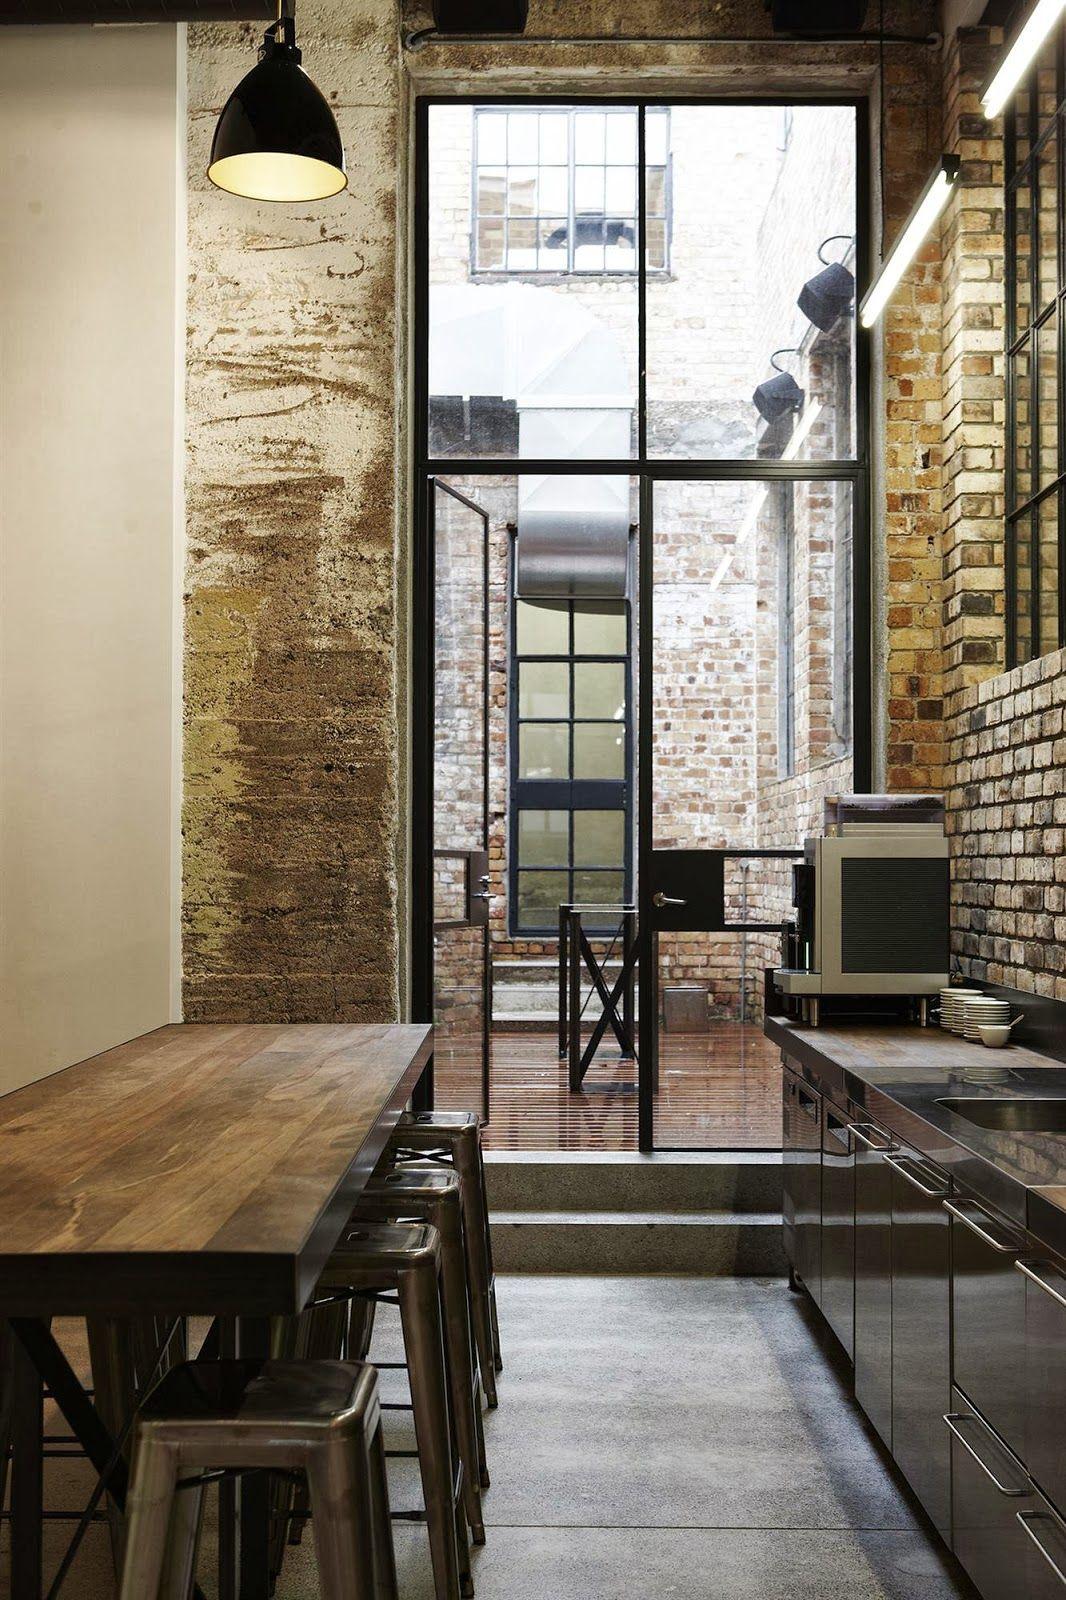 Exposed brick rustic industrial minimalist neutral earth tones monochrome open concept bright